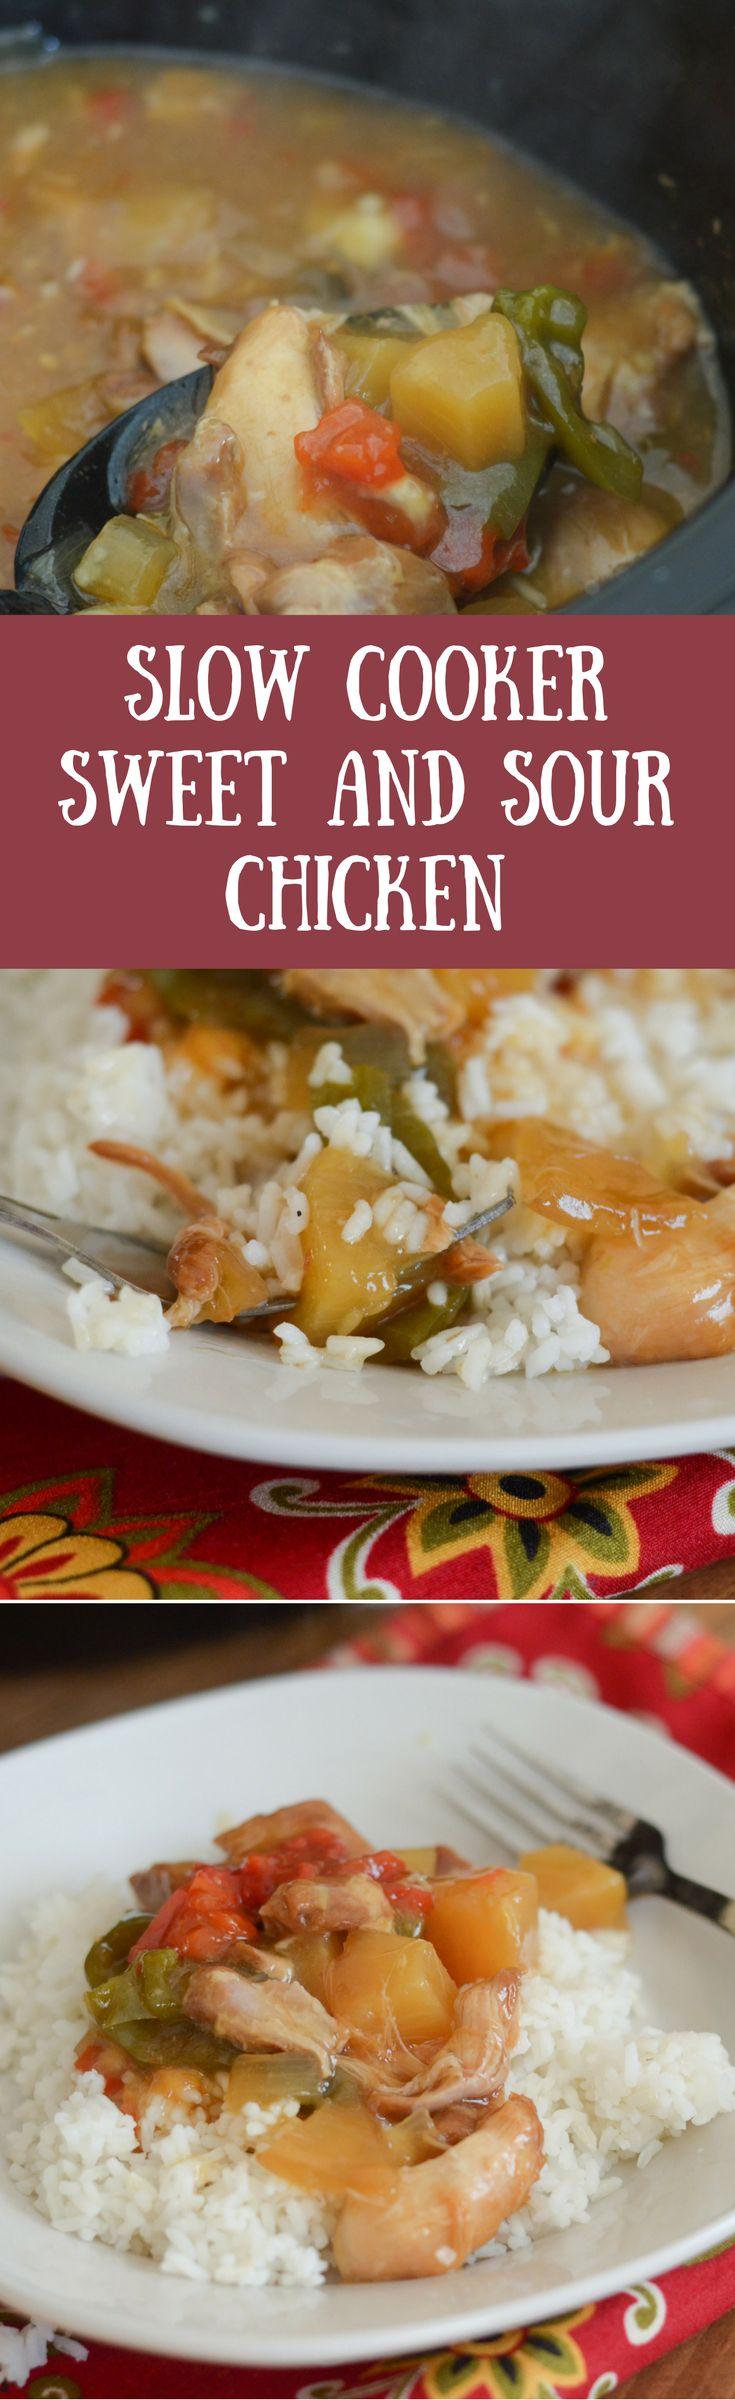 Gluten-Free Slow Cooker Sweet N' Sour Chicken